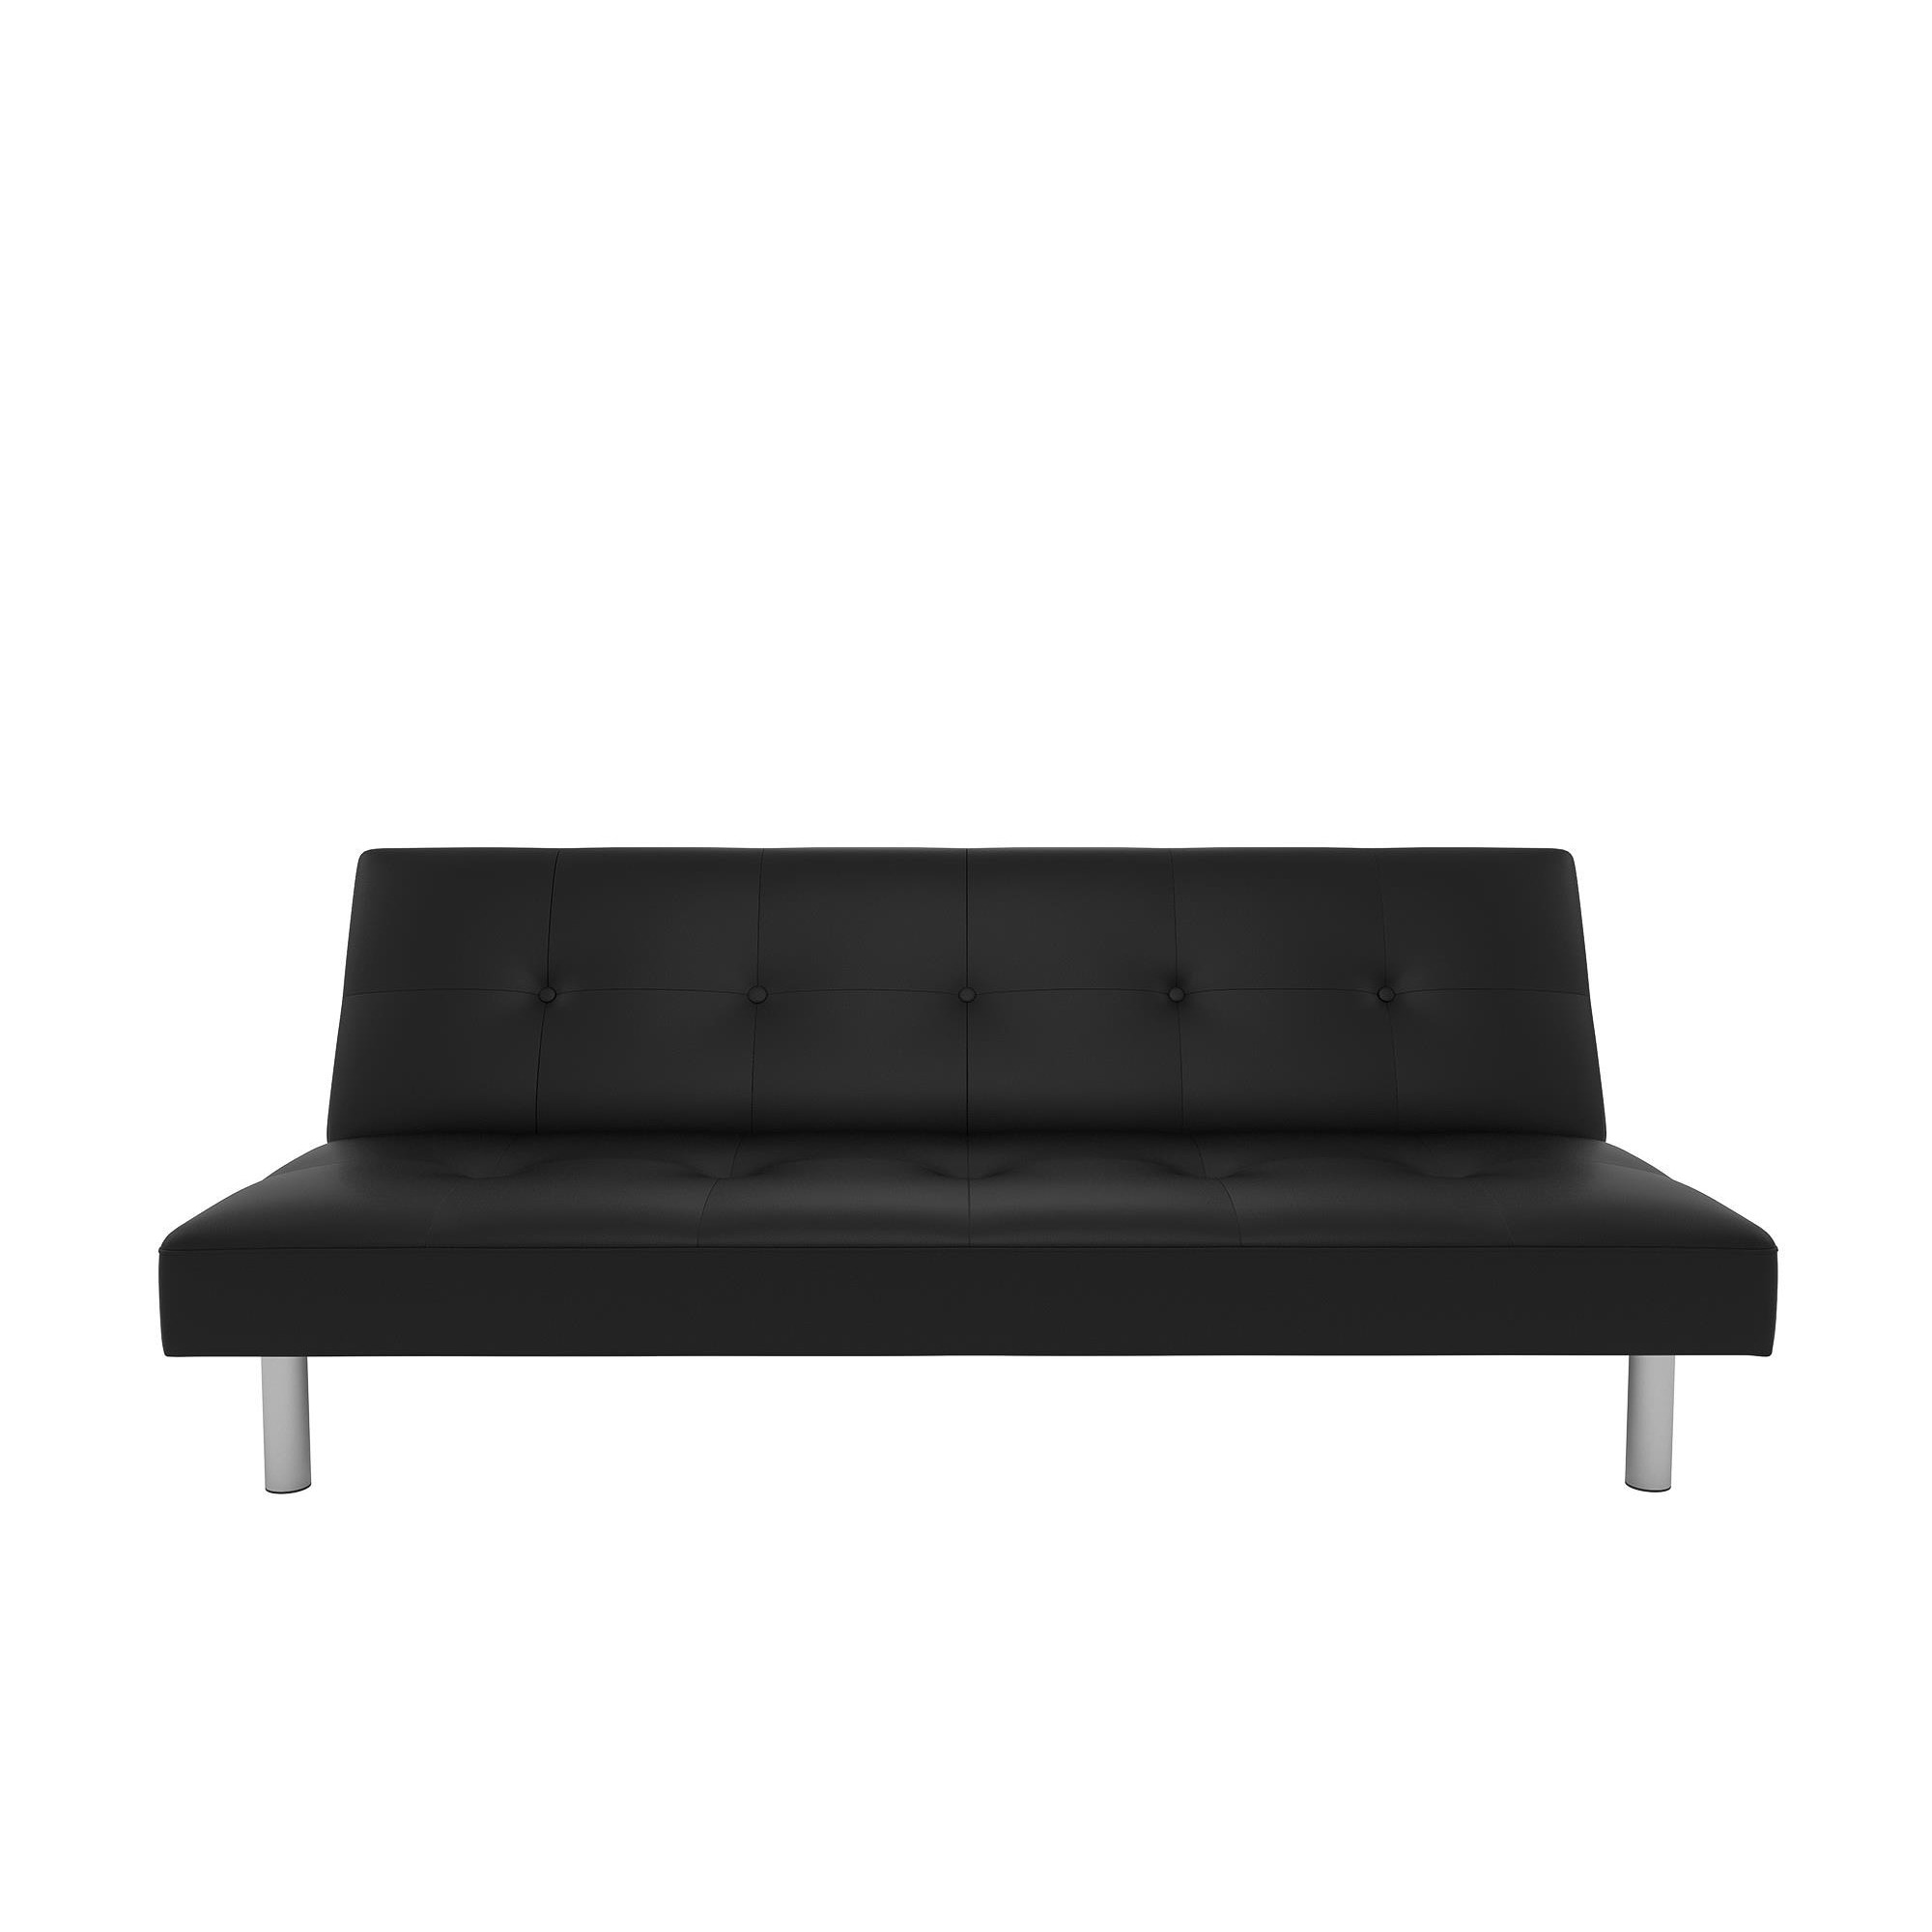 avenue greene noah futon sofa bed - free shipping today